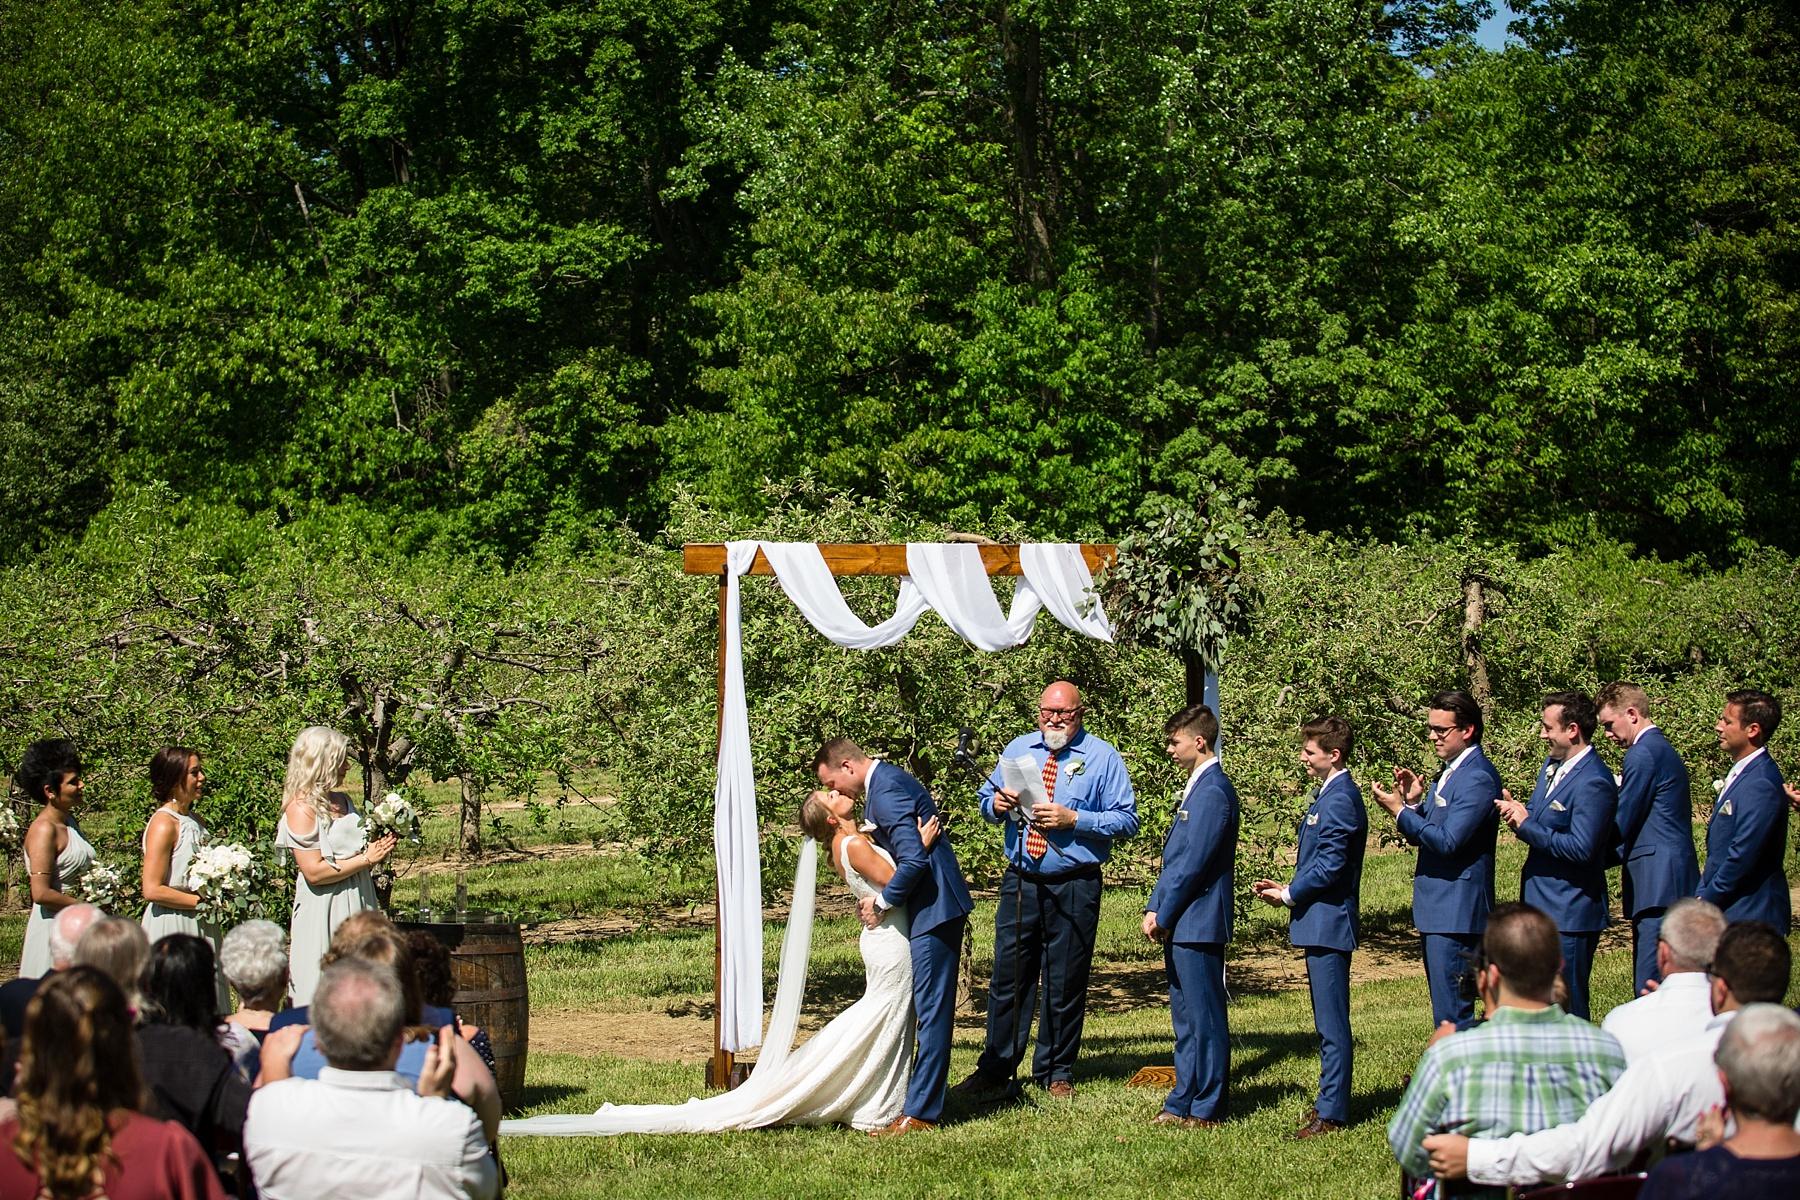 Brandon_Shafer_Photography_Kara_Doug_12_corners_Wedding_Benton_Harbor_0044.jpg